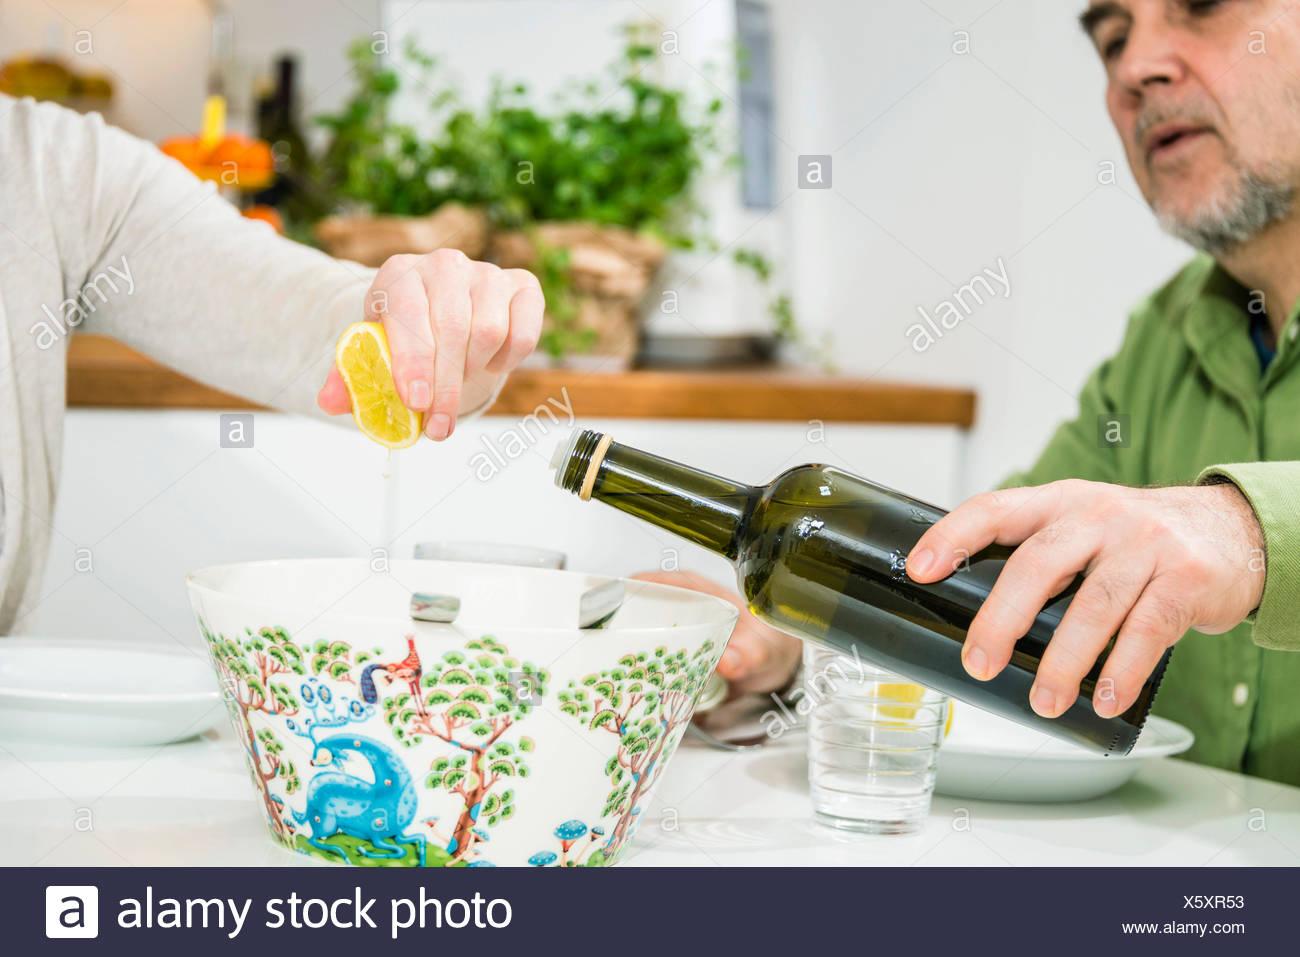 Senior uomo versando olio in insalatiera Immagini Stock